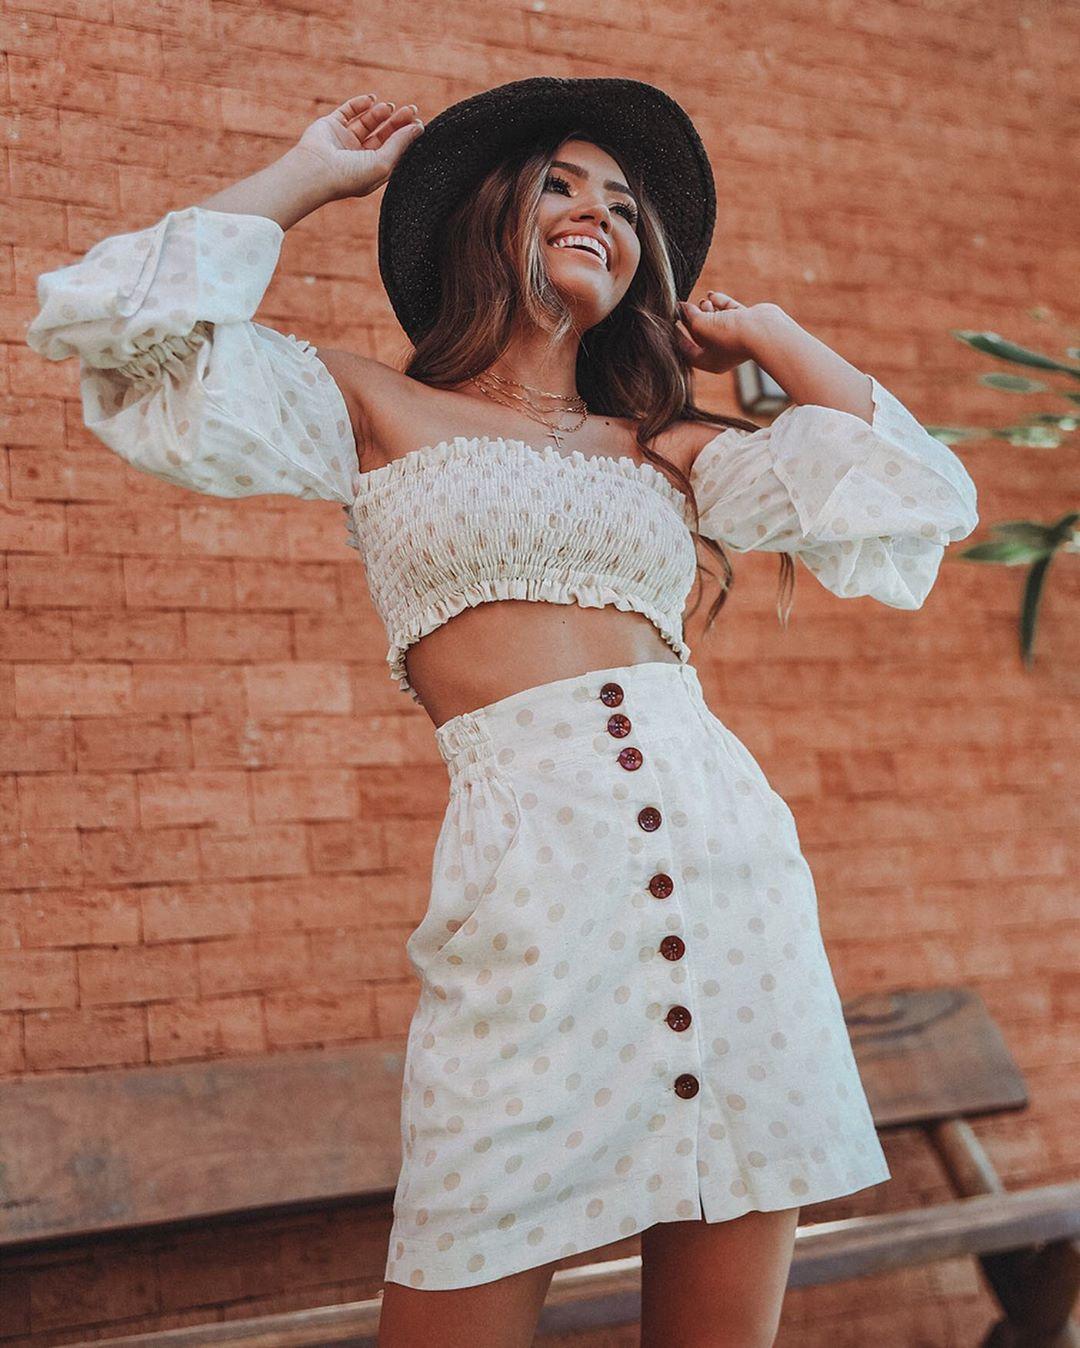 maiza santa rita, top 10 de miss brasil mundo 2019. 70420510